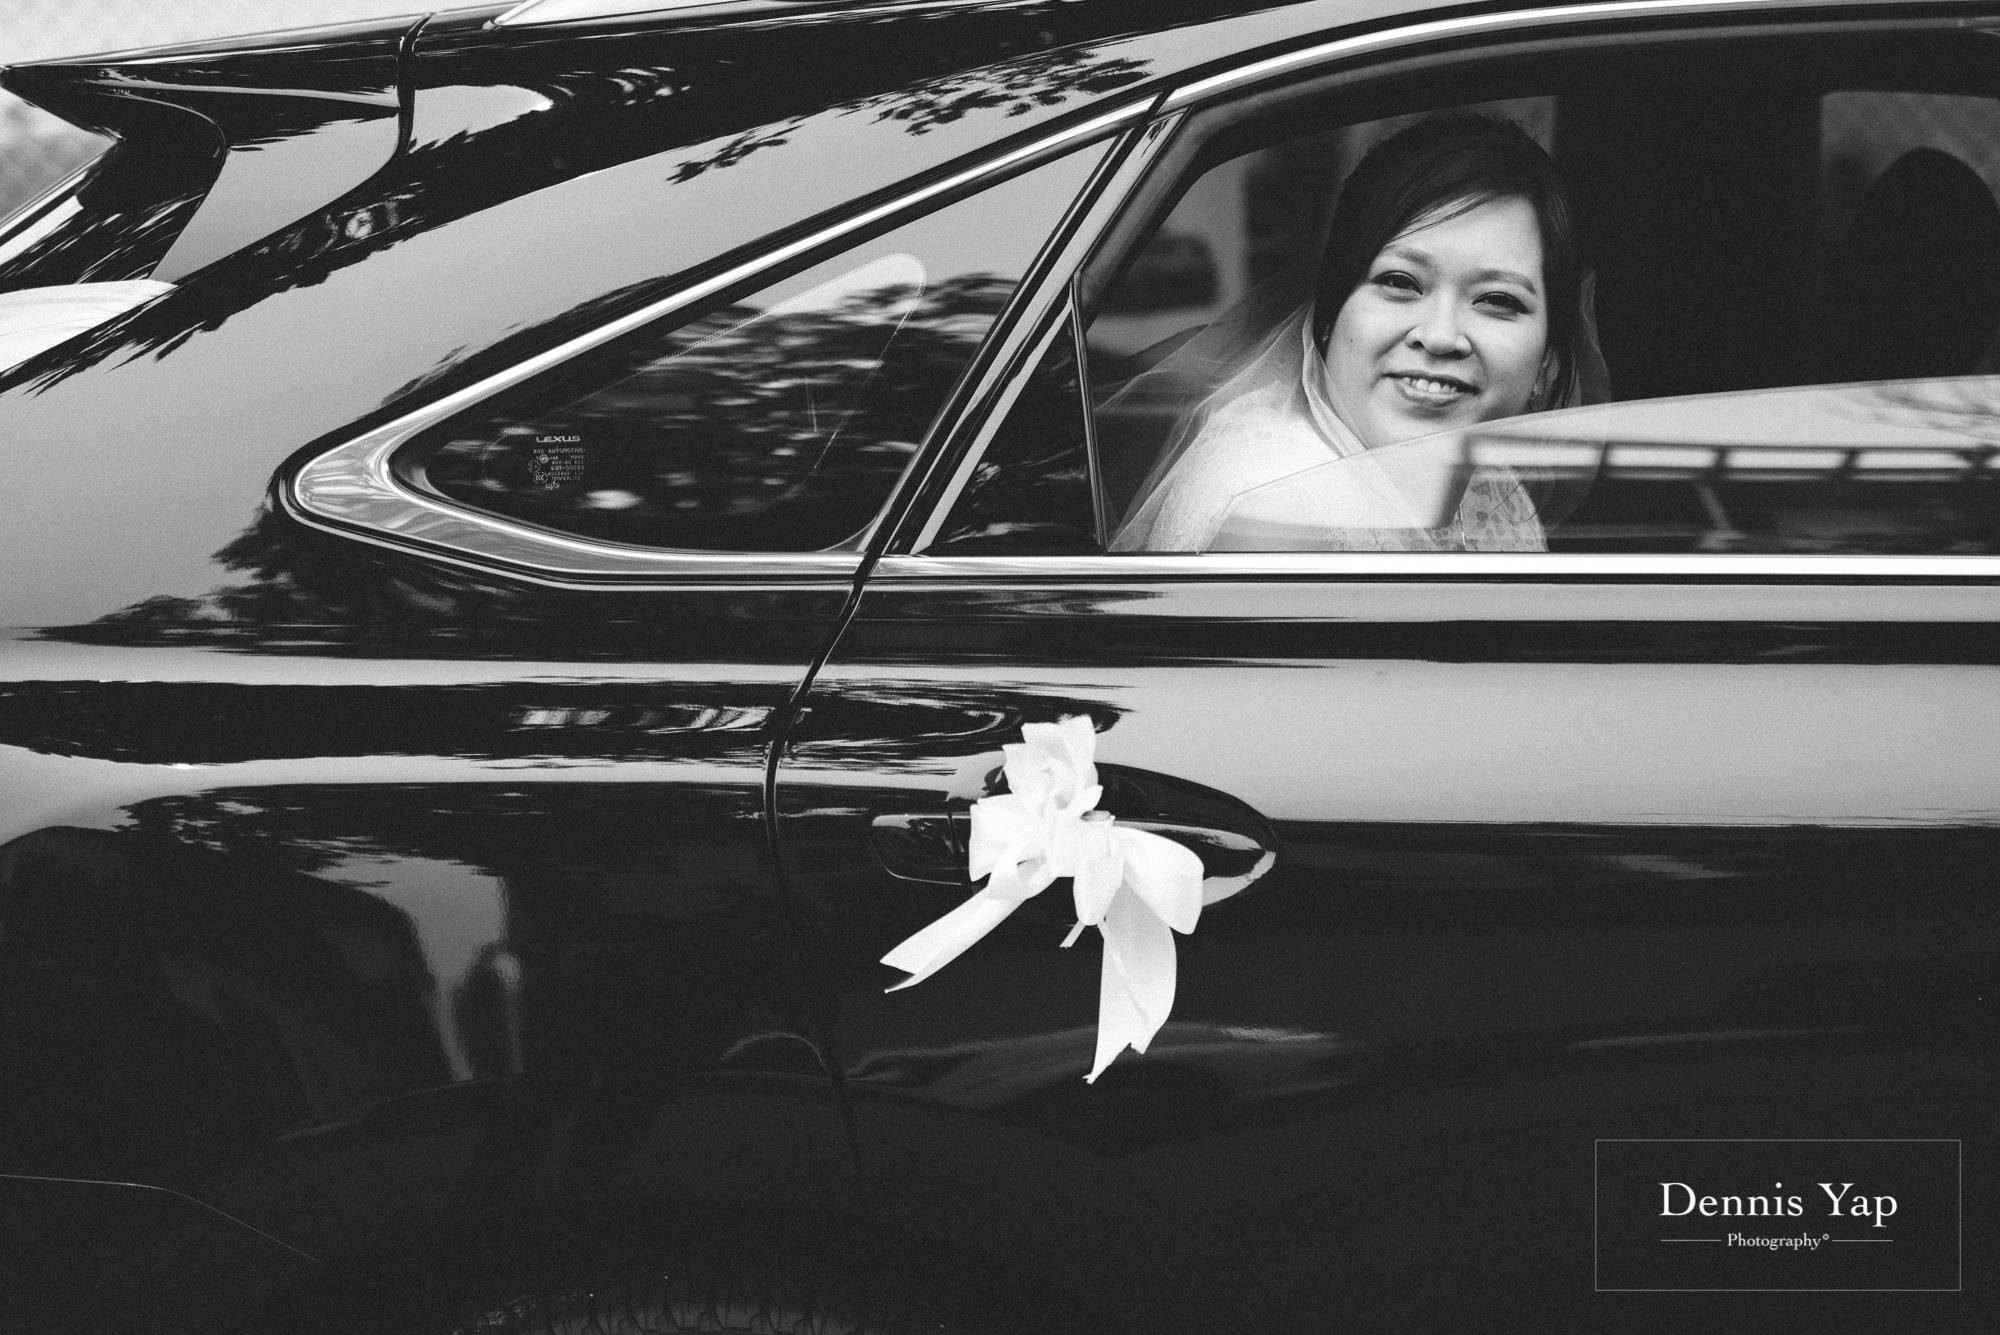 ino sheri black white church wedding st thomas more subang jaya dennis yap photography touching love beloved australia indonesia-22.jpg